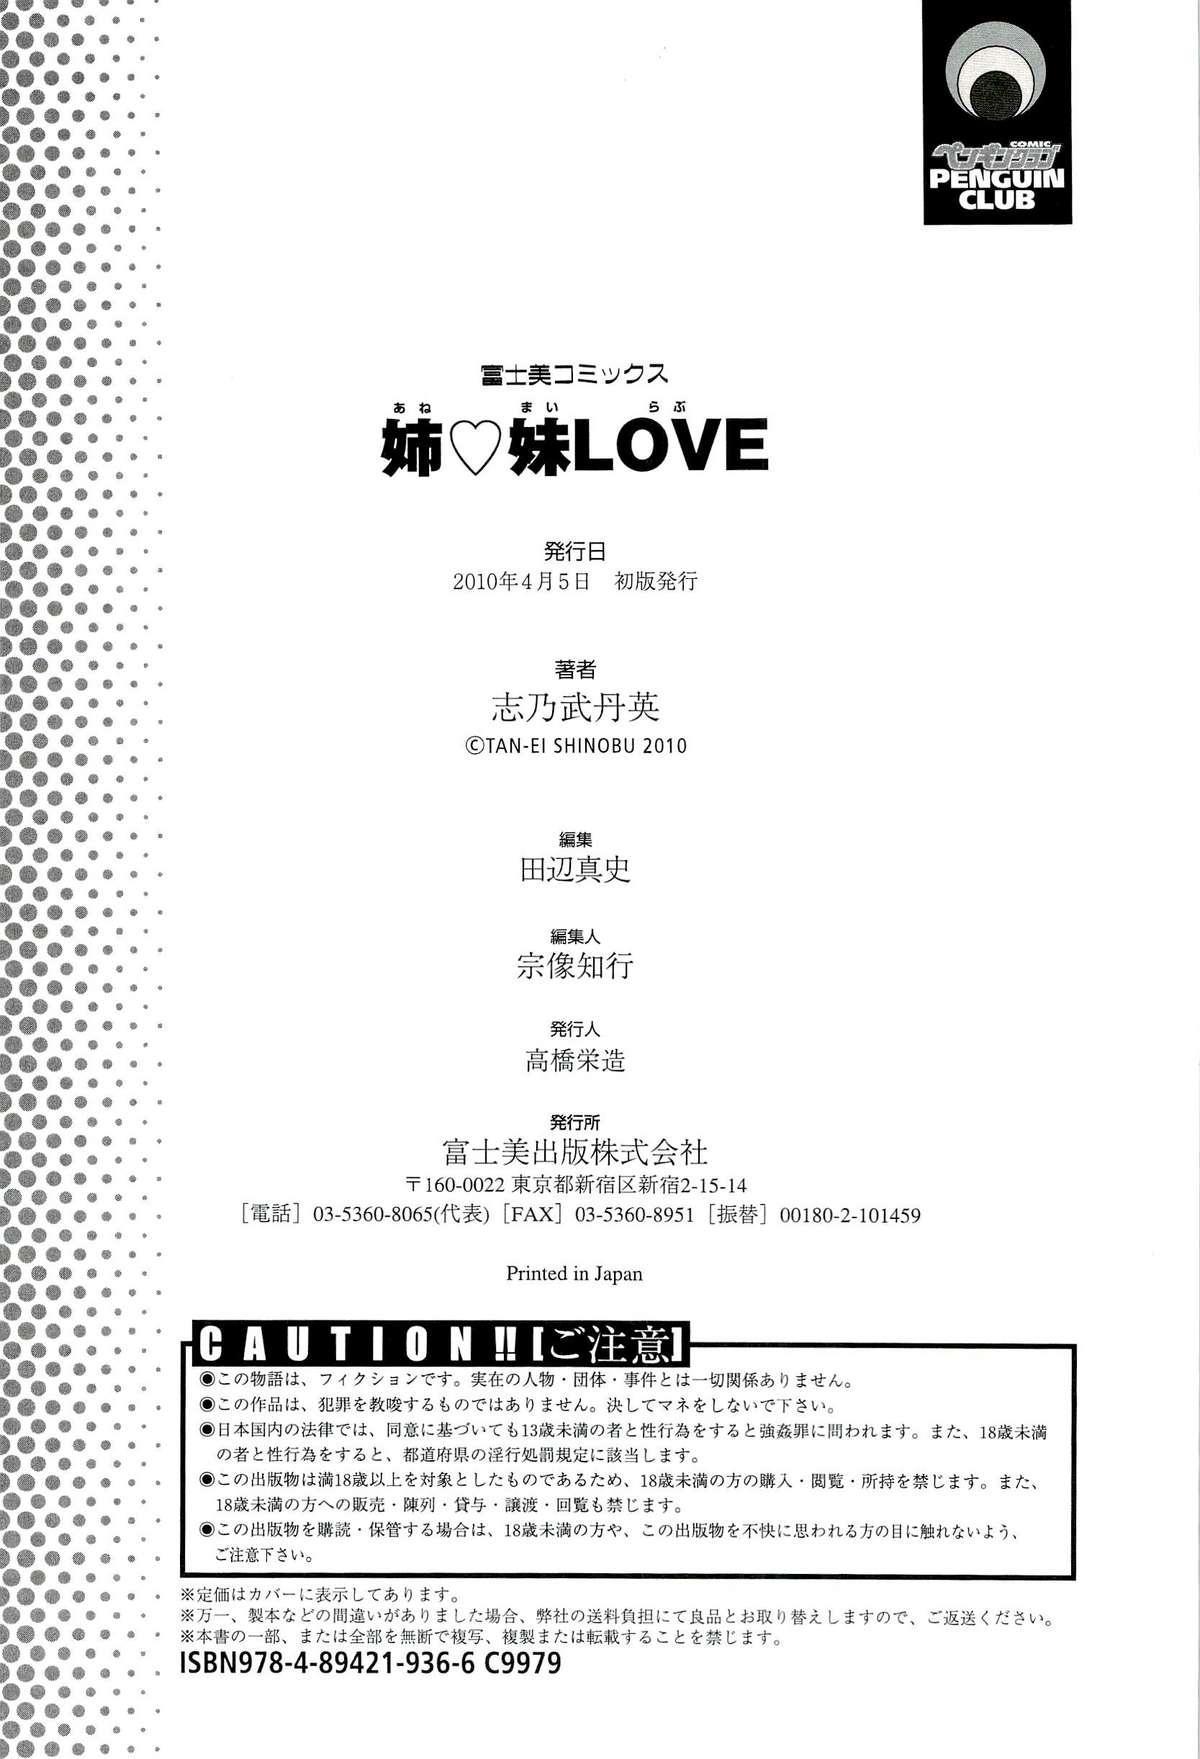 [Shinobu Tanei] Ane ♡ Imouto Love | Big-Sis Lil-Sis Love [English] {Tadanohito} 200